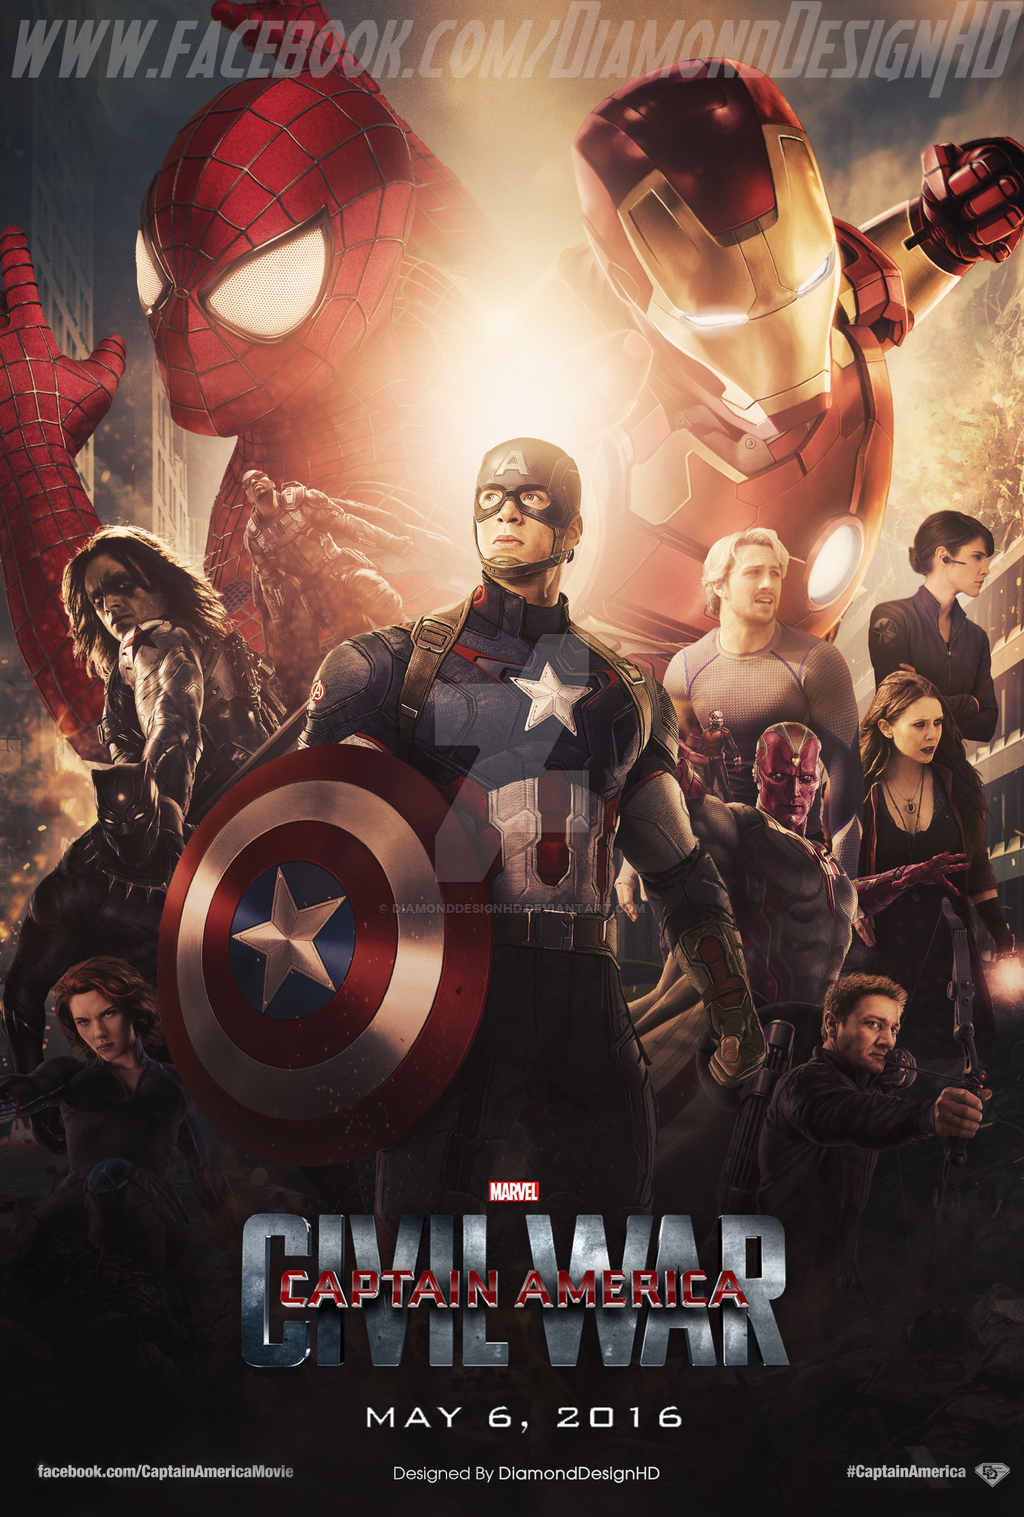 HD Images 1080p Captain America Civil War HD Wallpapers 1024x1517